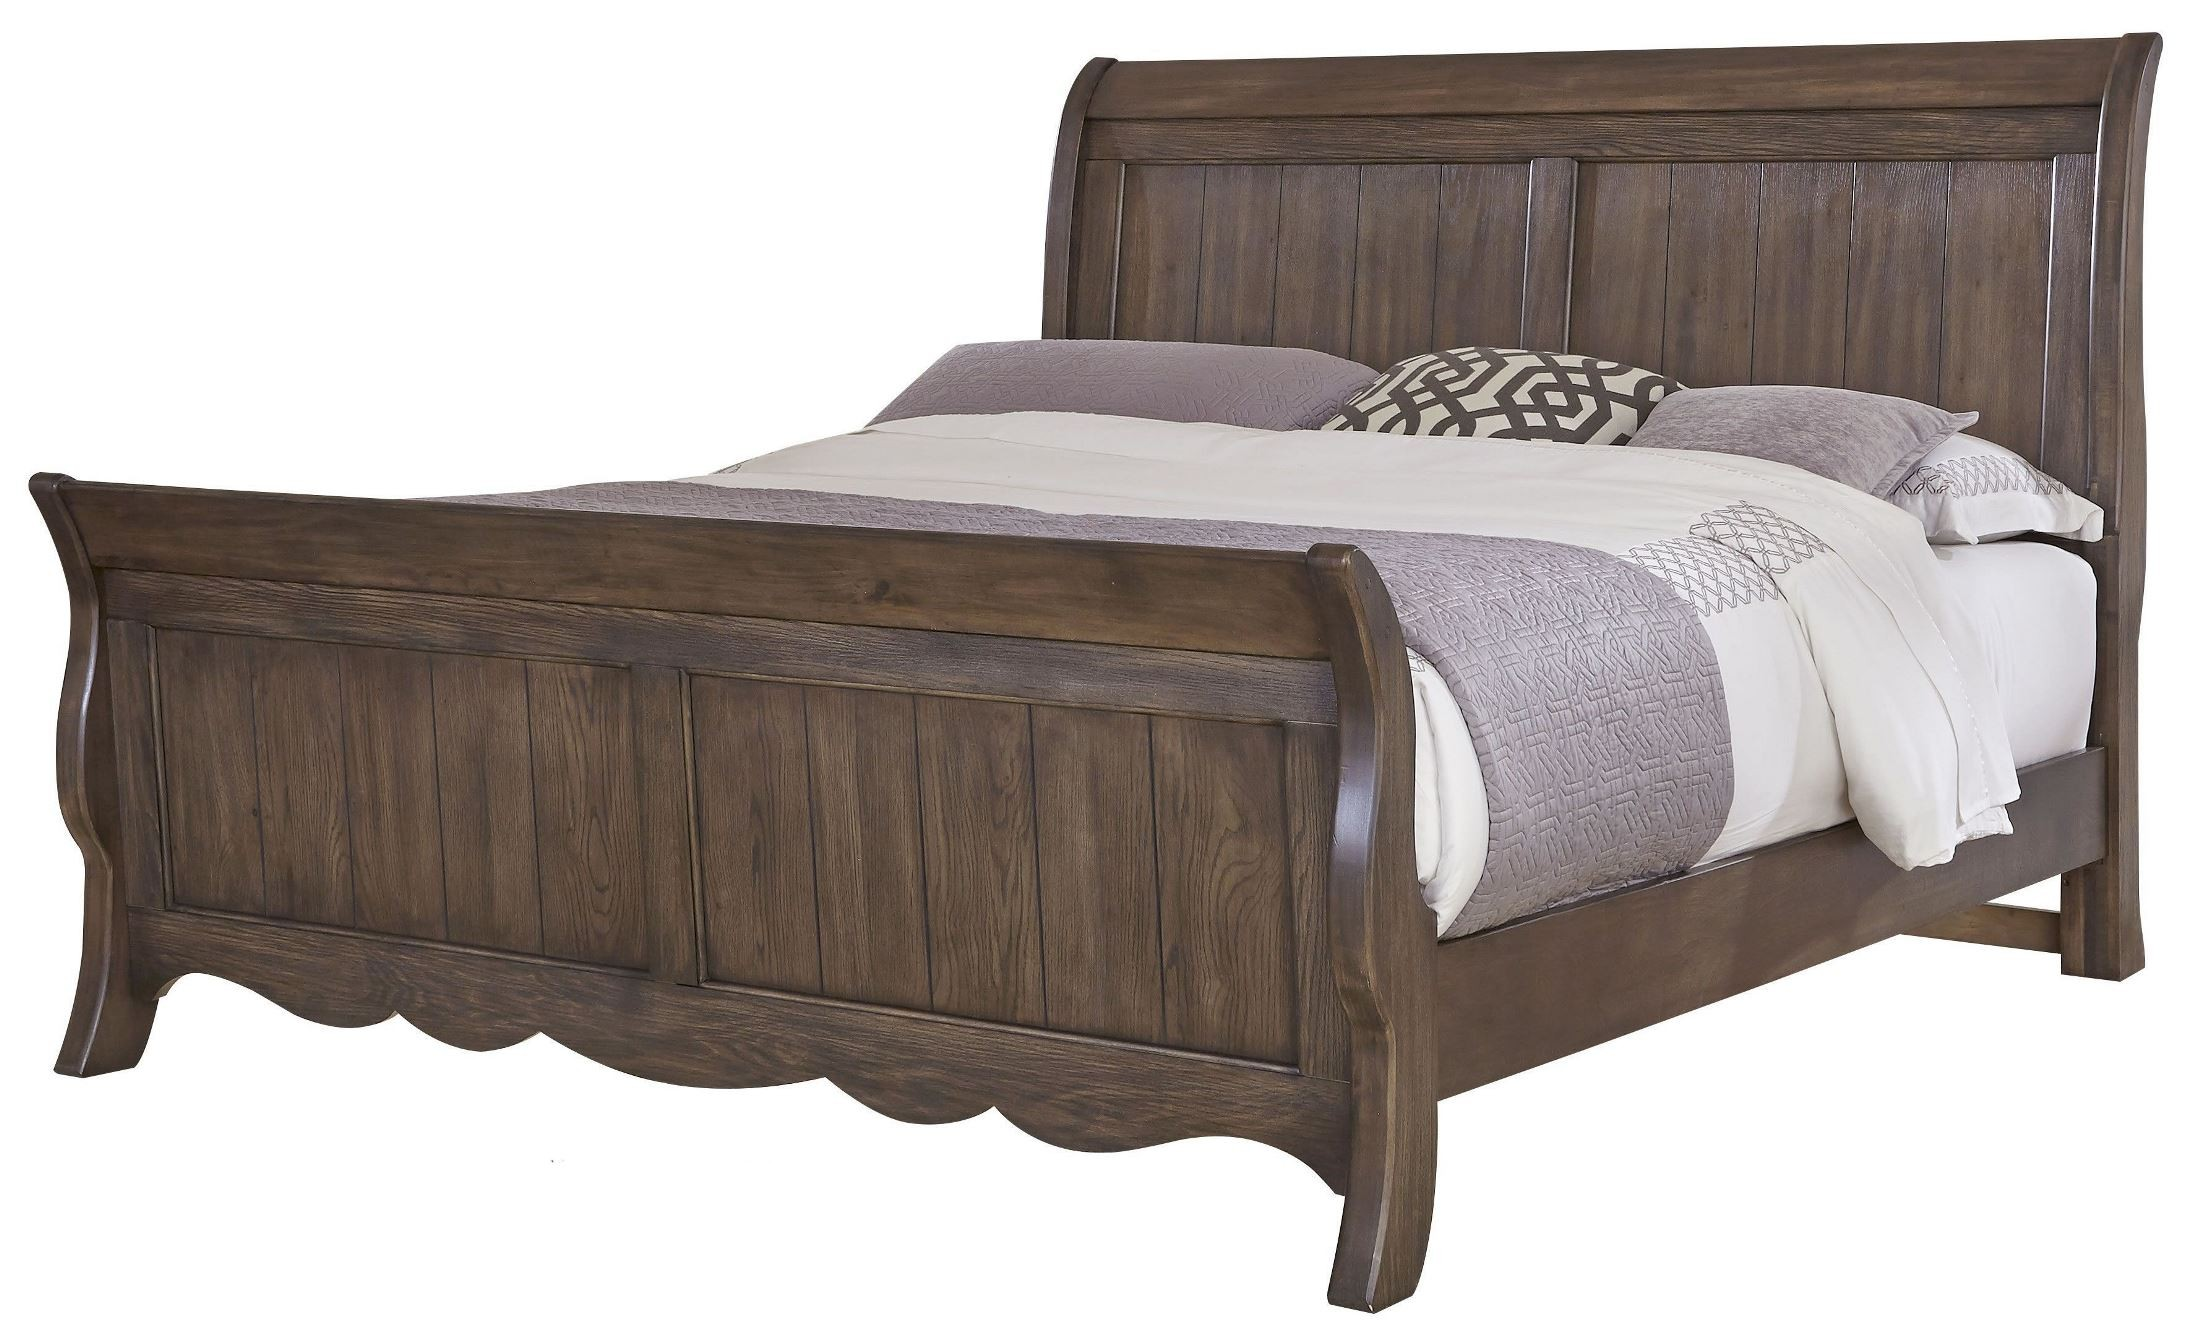 villa sophia dark roast king low profile sleigh bed 520 663 766 622 vaughan bassett. Black Bedroom Furniture Sets. Home Design Ideas